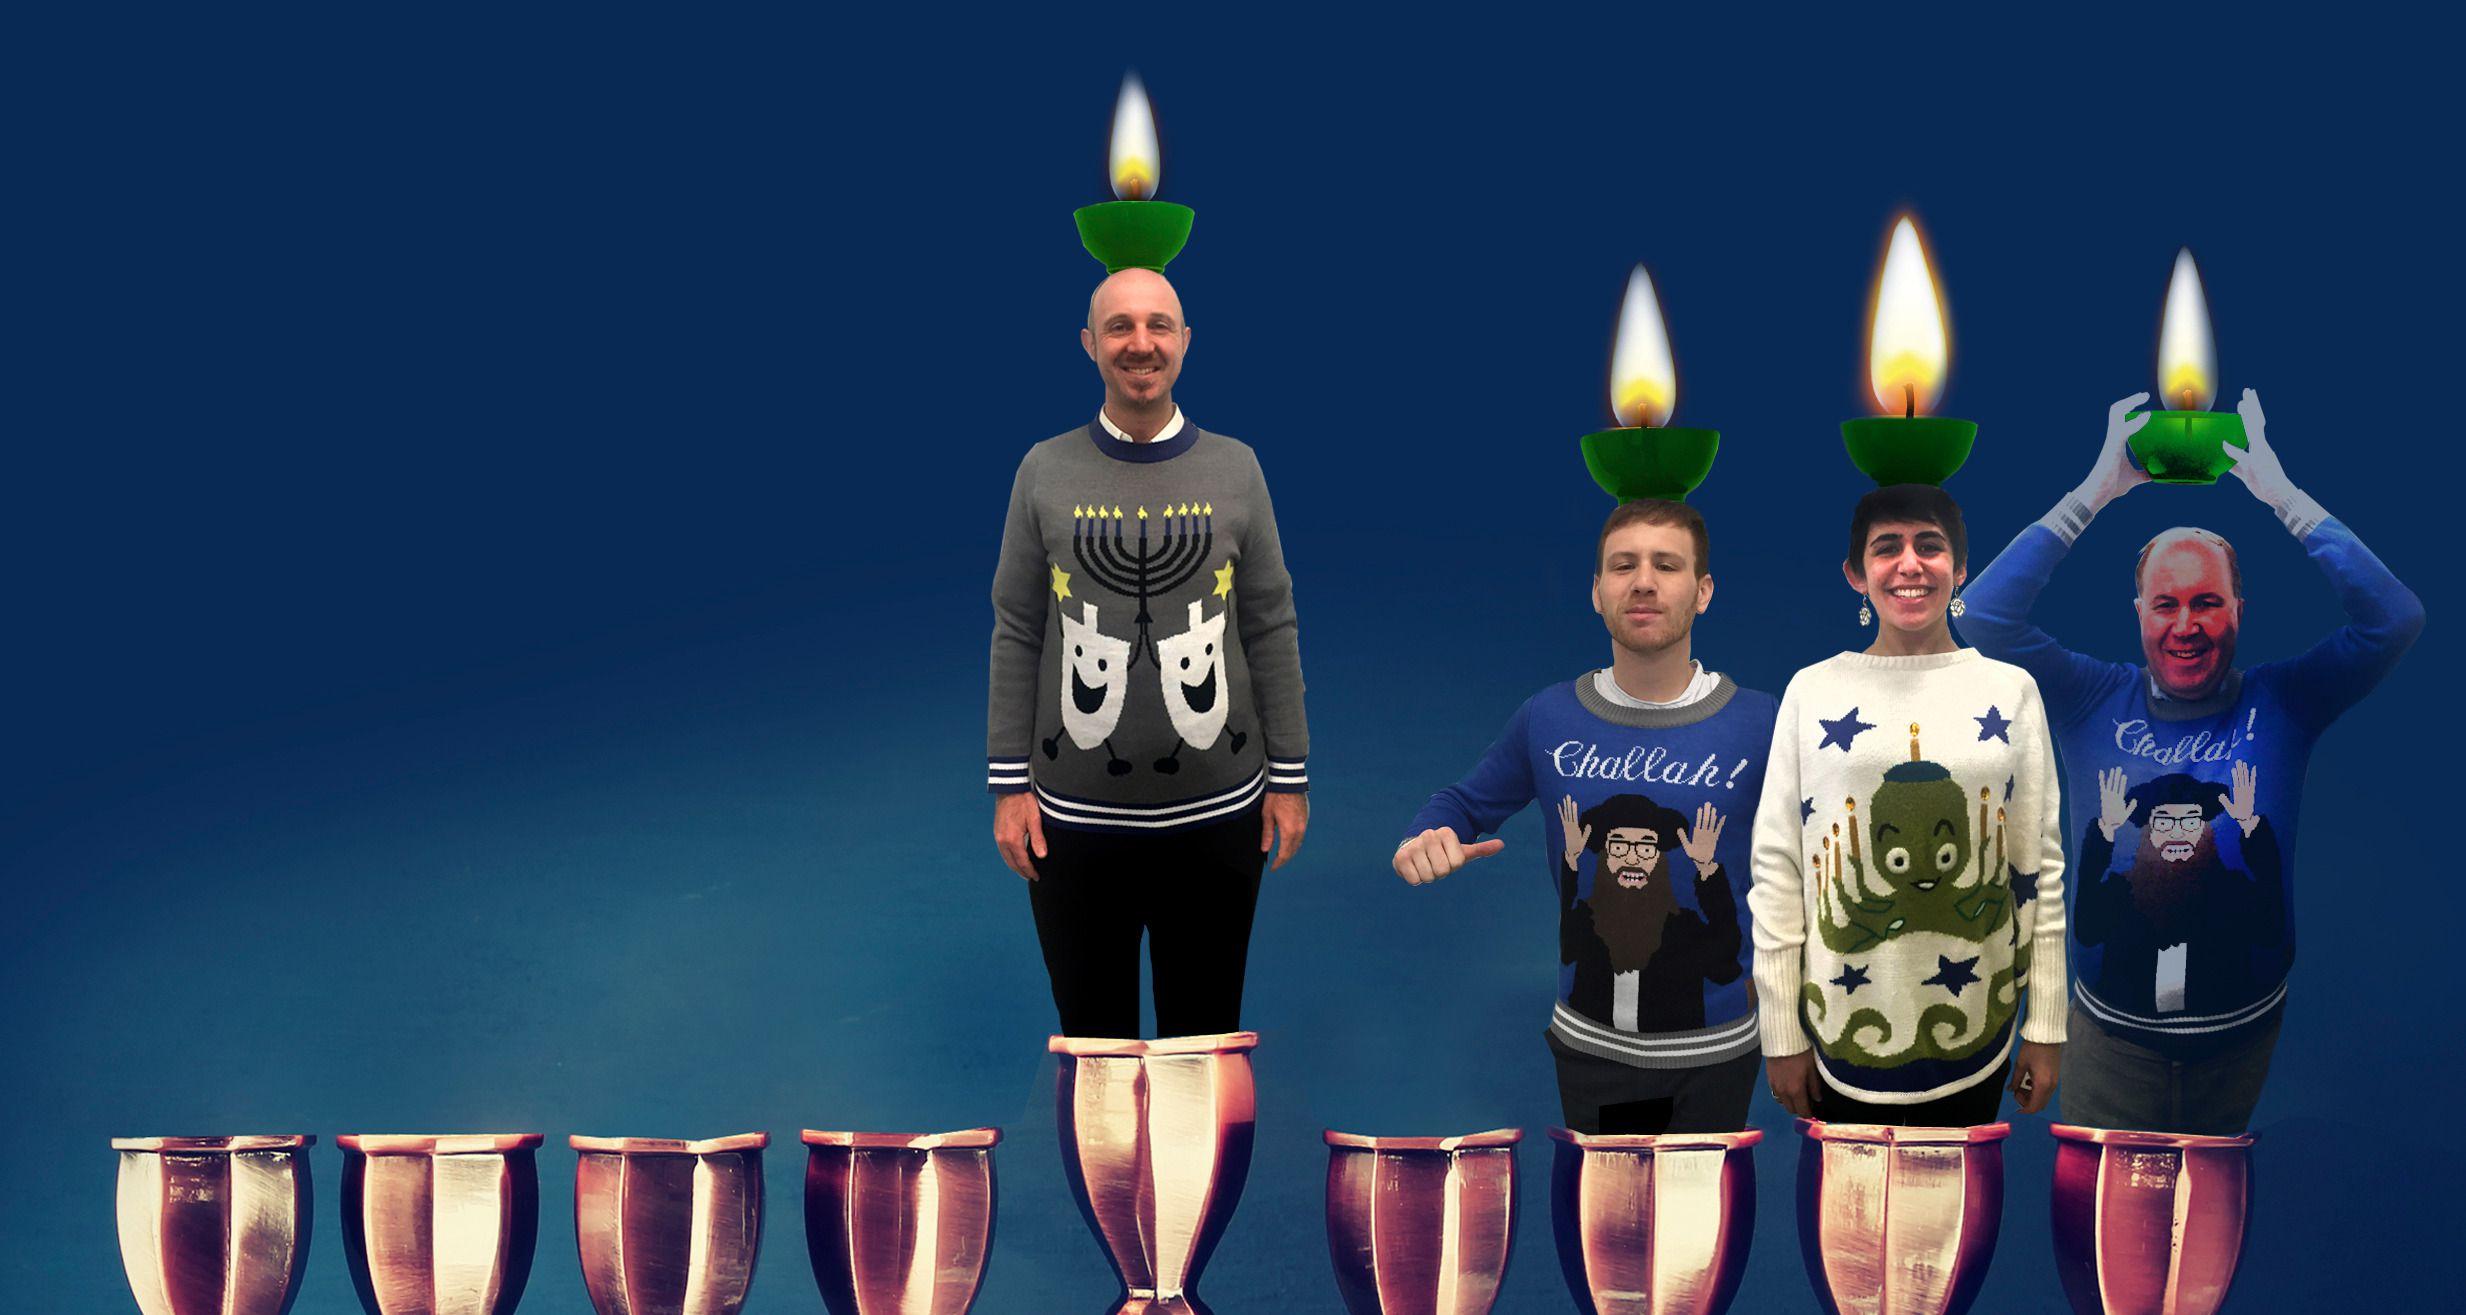 Human Hanukiah: Forward staff members glow with seasonal pride in ugly Hanukkah sweaters from Lord & Taylor and Tipsy Elves.